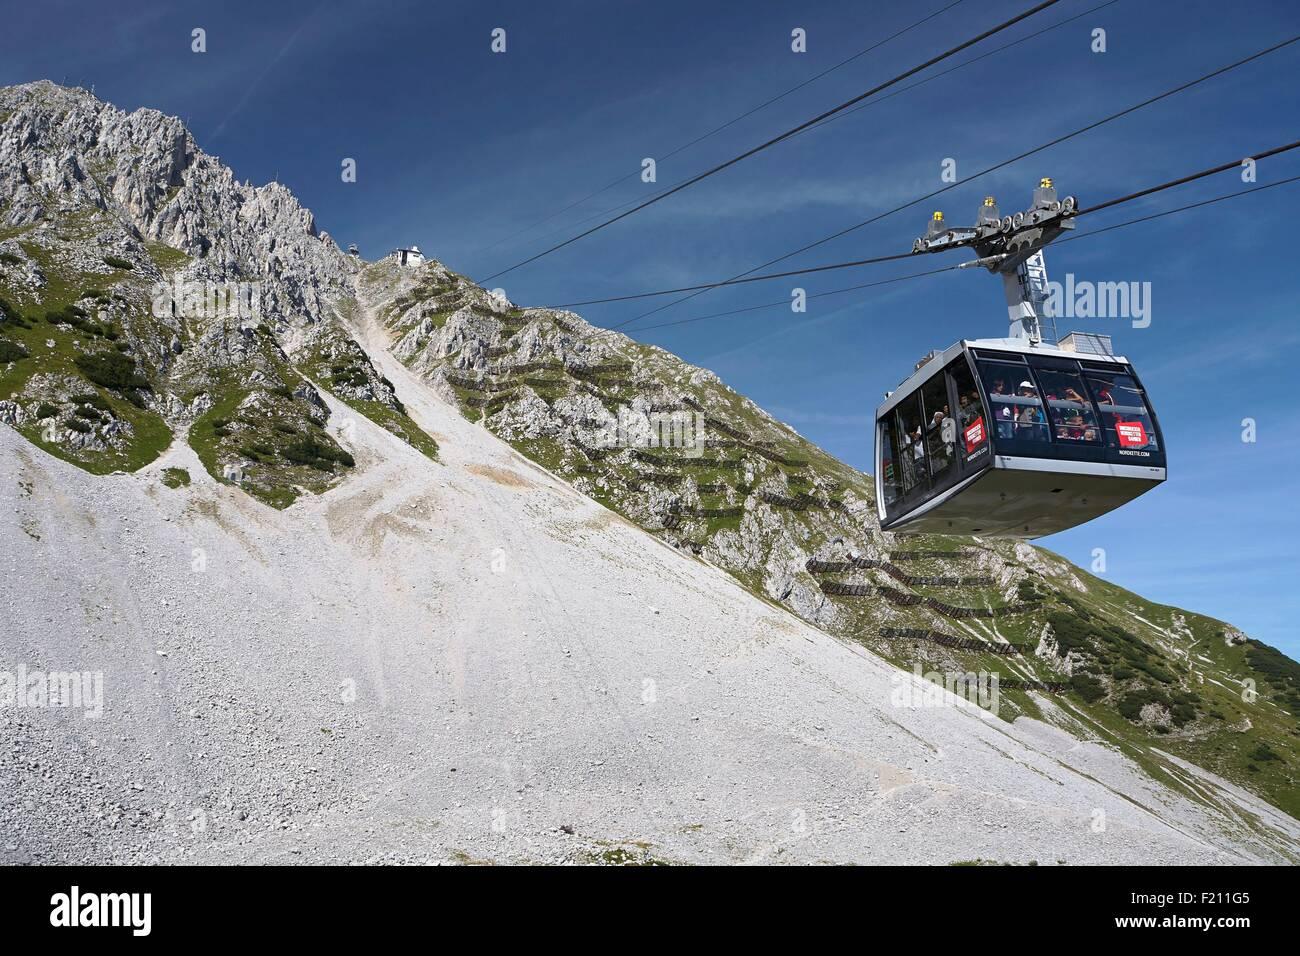 Austria, Tyrol, Innsbruck, Cableway at the Innsbrucker Nordkettenbahnen station - Stock Image